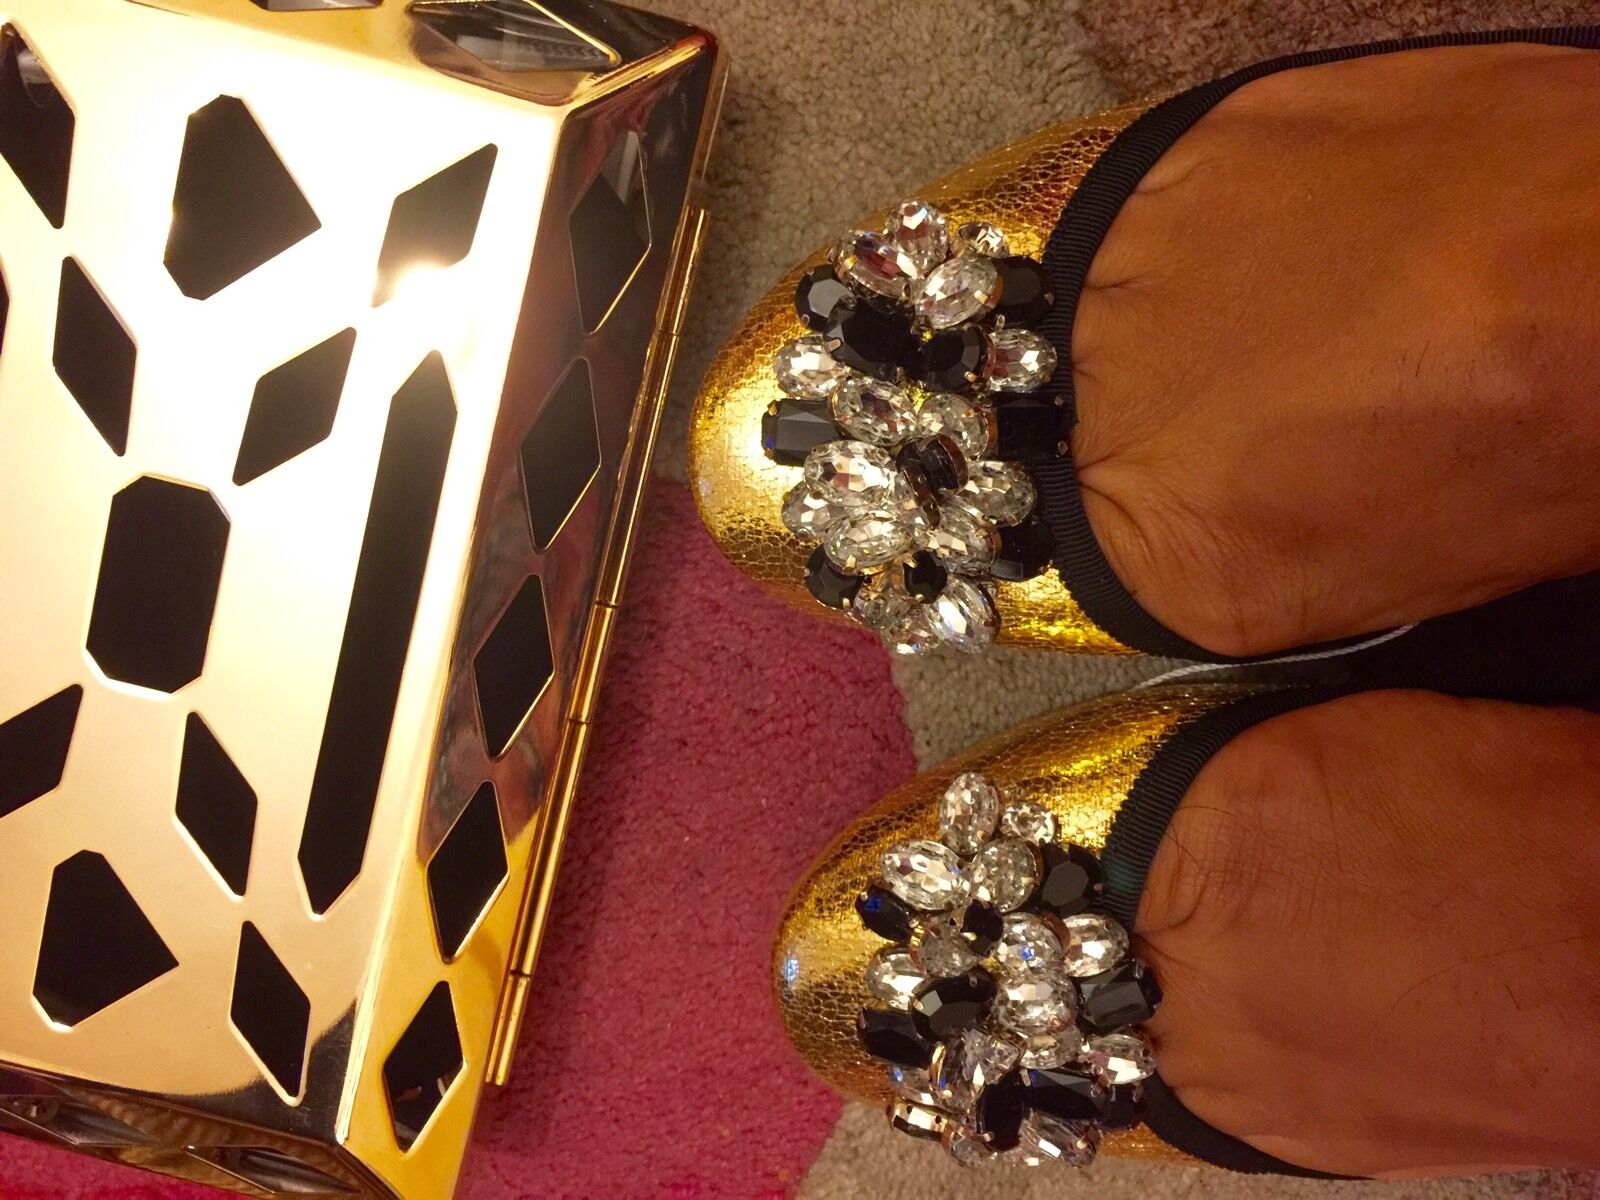 ZARA Jewelled Leder Gold Flat Studded Jewelled ZARA Ballerina Sandales Schuhes UK 5 Euro 38 edb73b